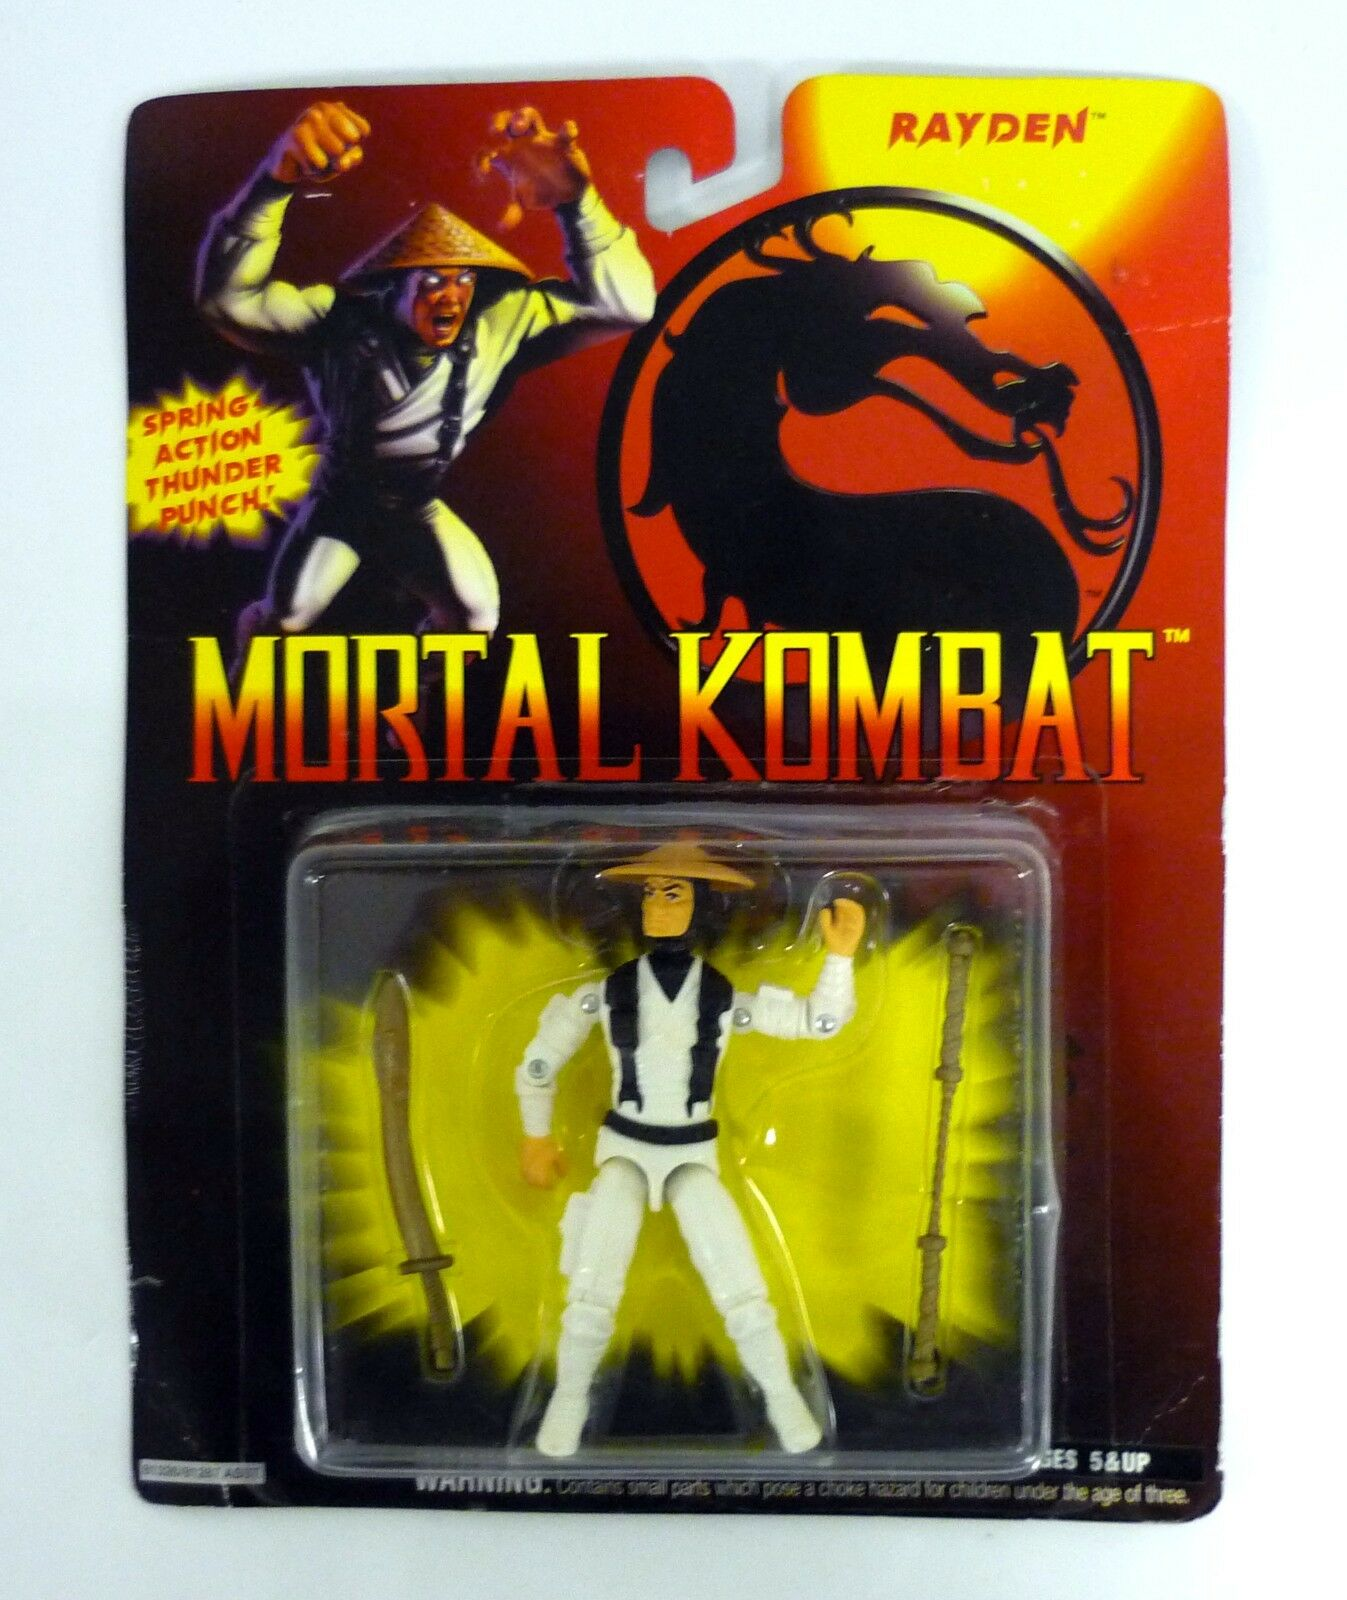 Mortal Kombat Rayden Vintage Gi Joe Action Figure Moc Completo 1994